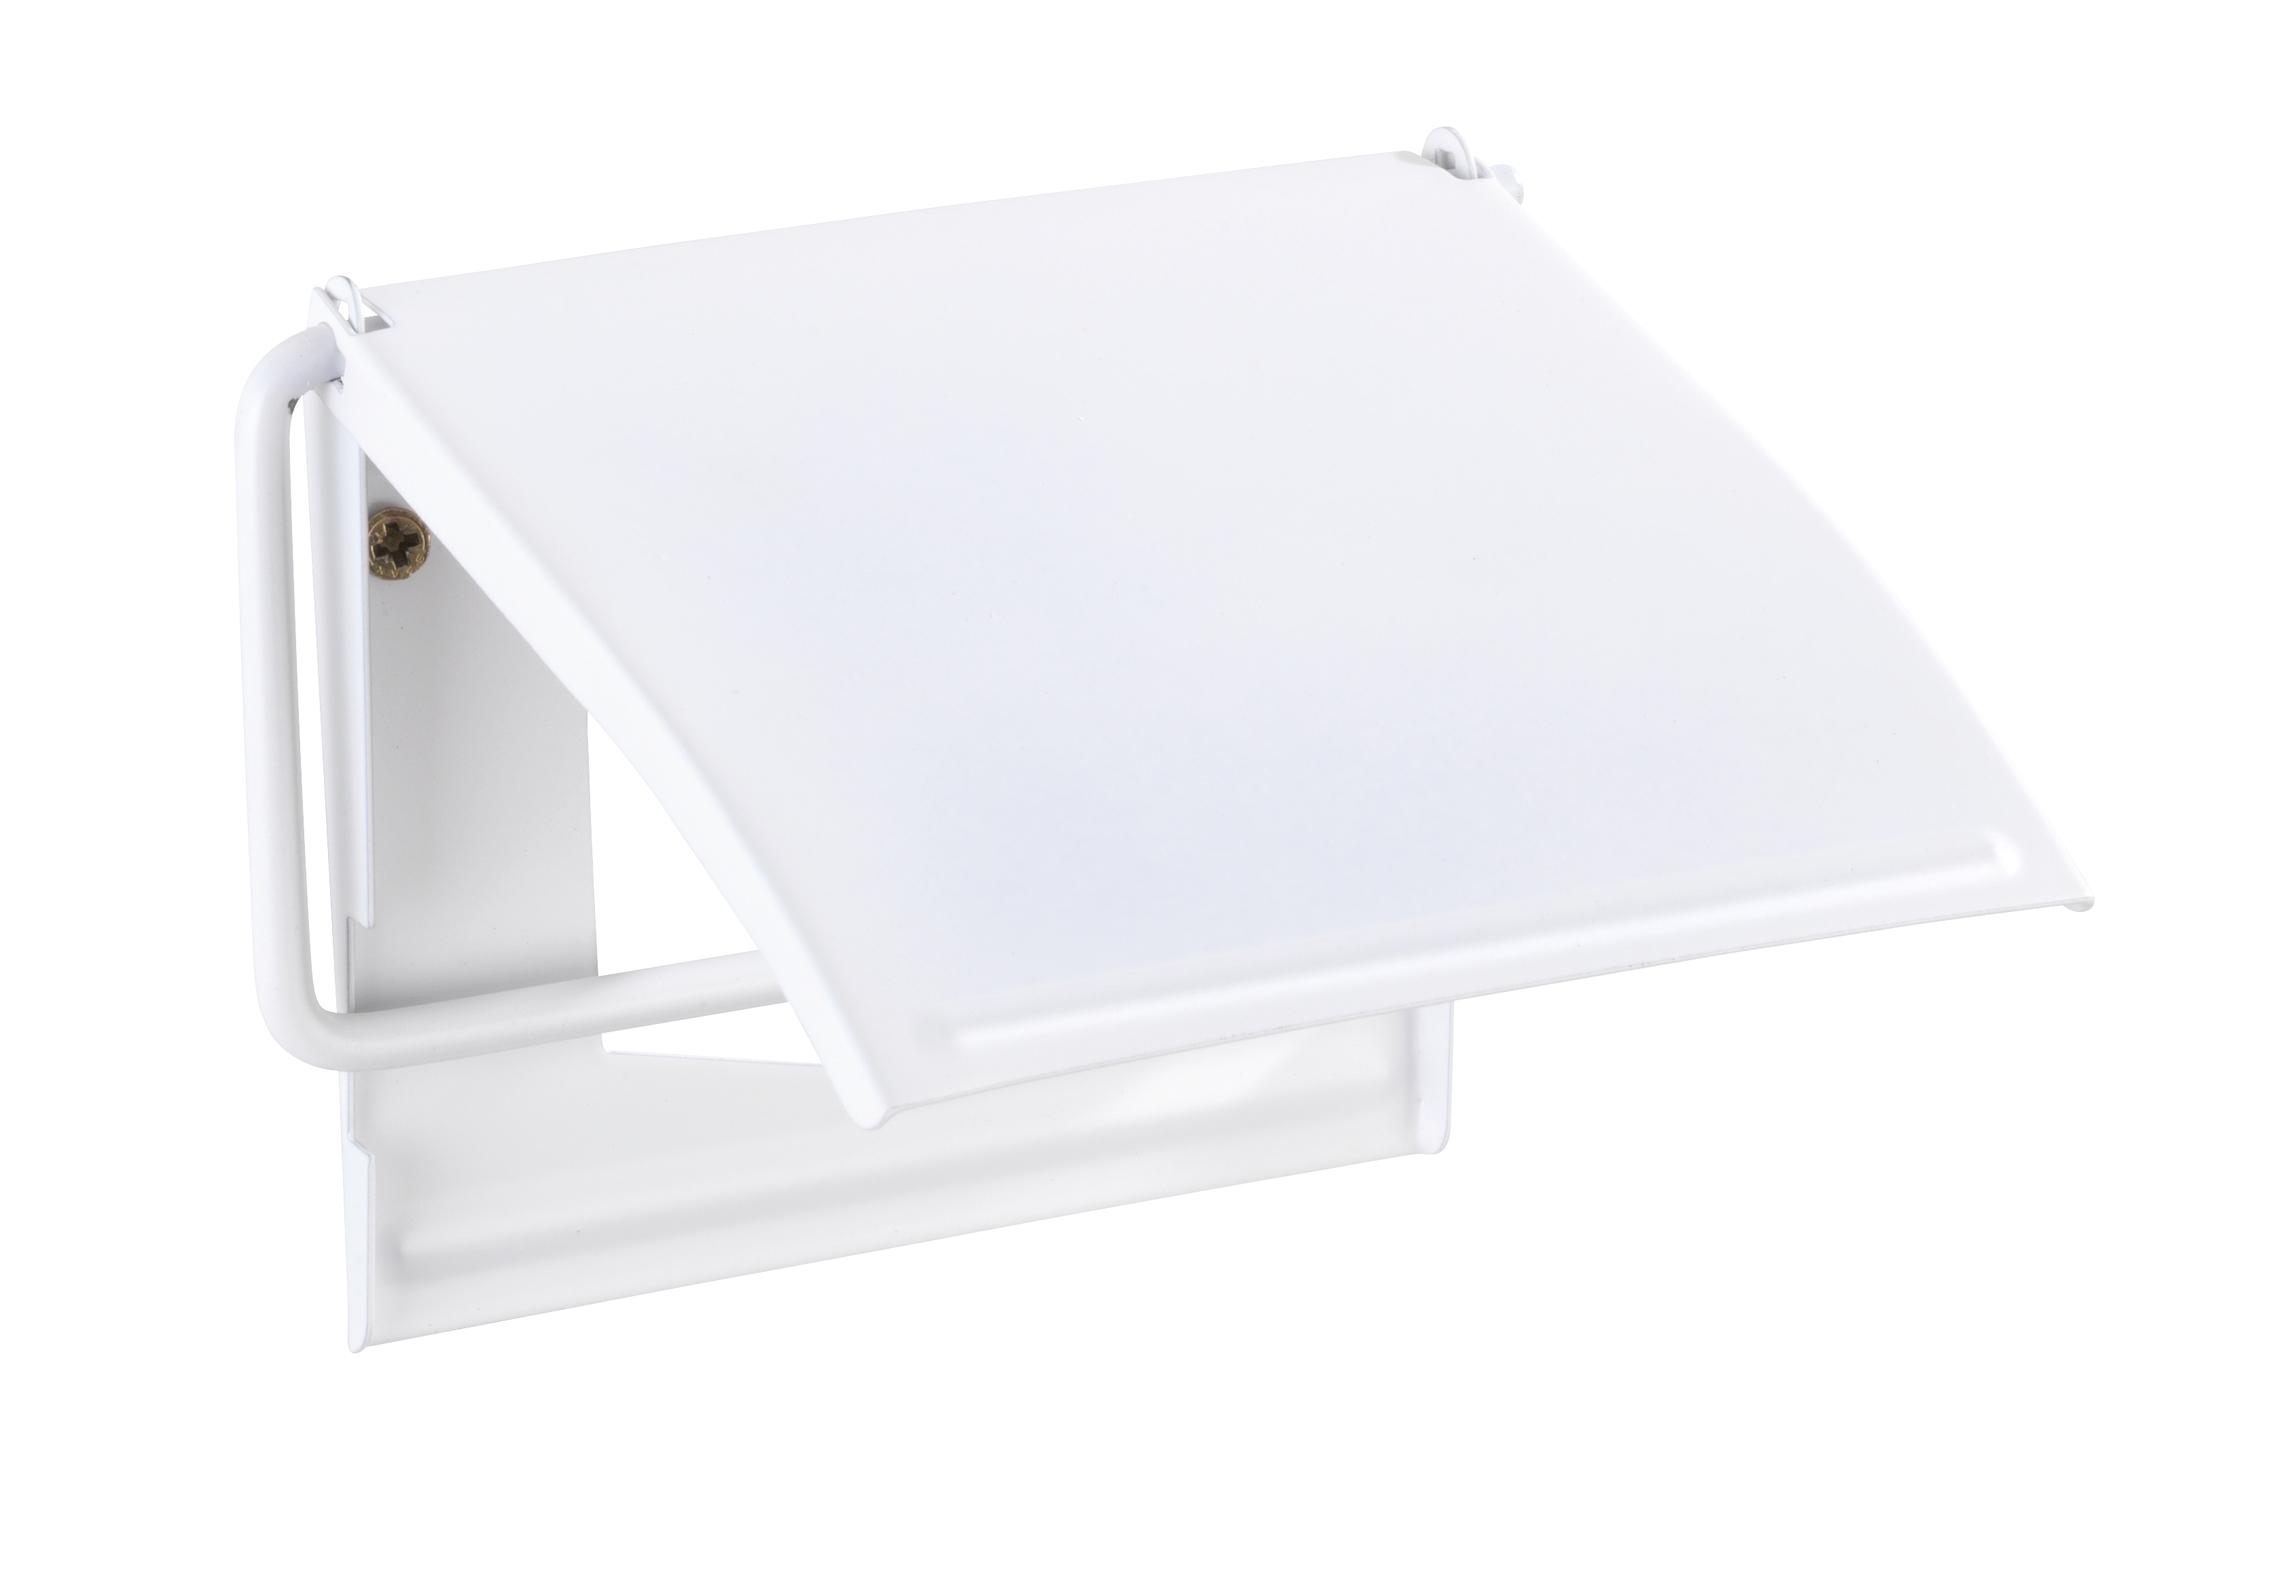 Suport pentru hartie igienica, Cover Alb, l13,5xA2,5xH12 cm poza